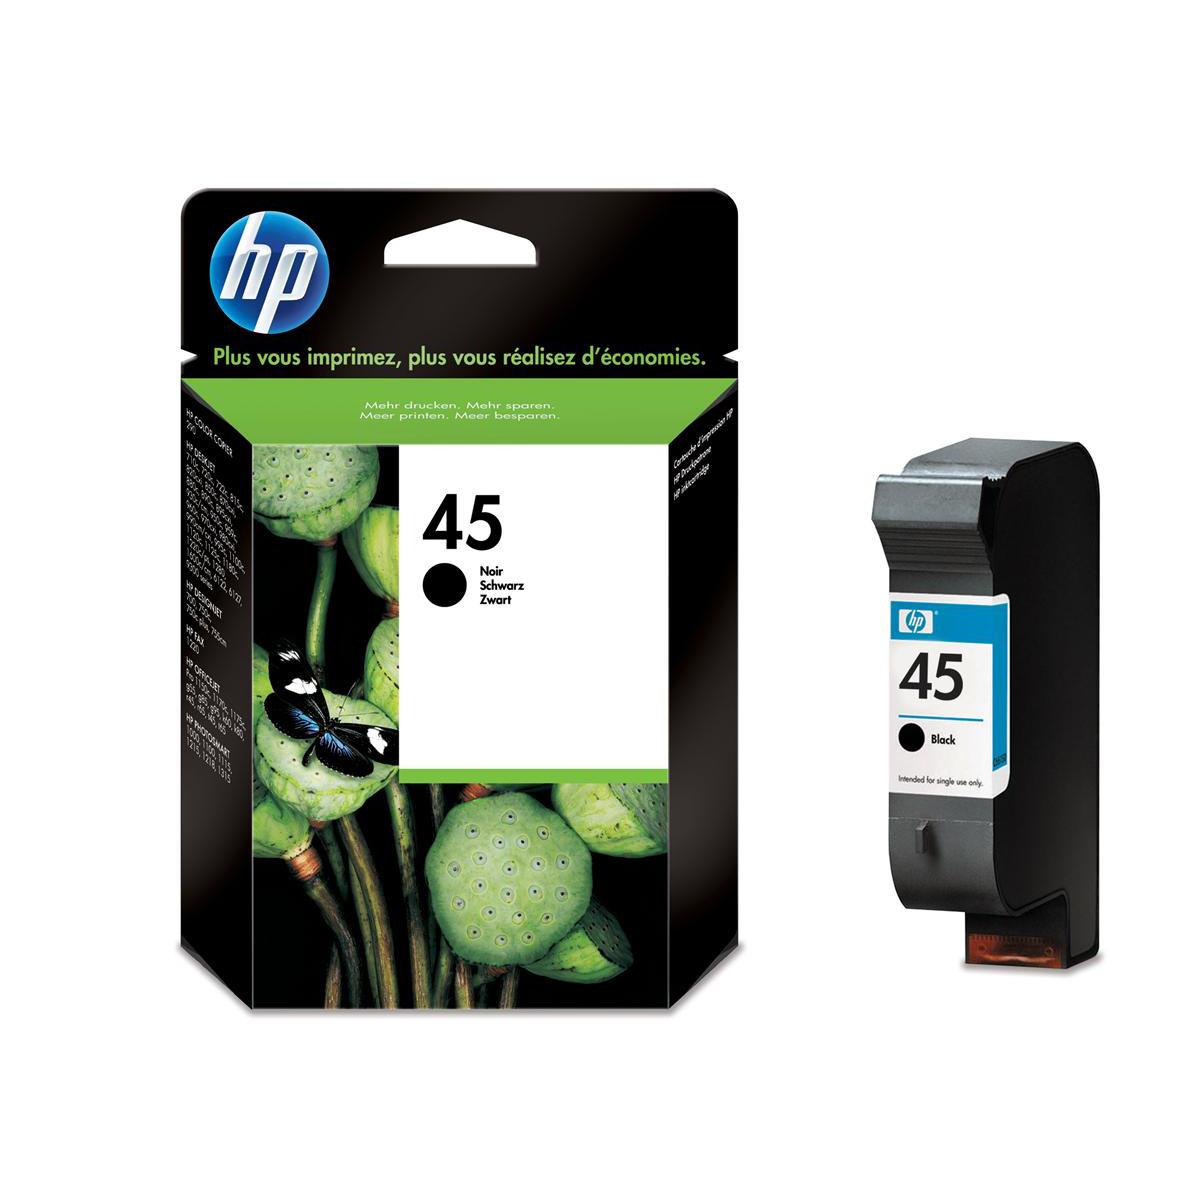 Ink cartridges Hewlett Packard HP No.45 Inkjet Cartridge High Yield Page Life 930pp 42ml Black Ref 51645AE